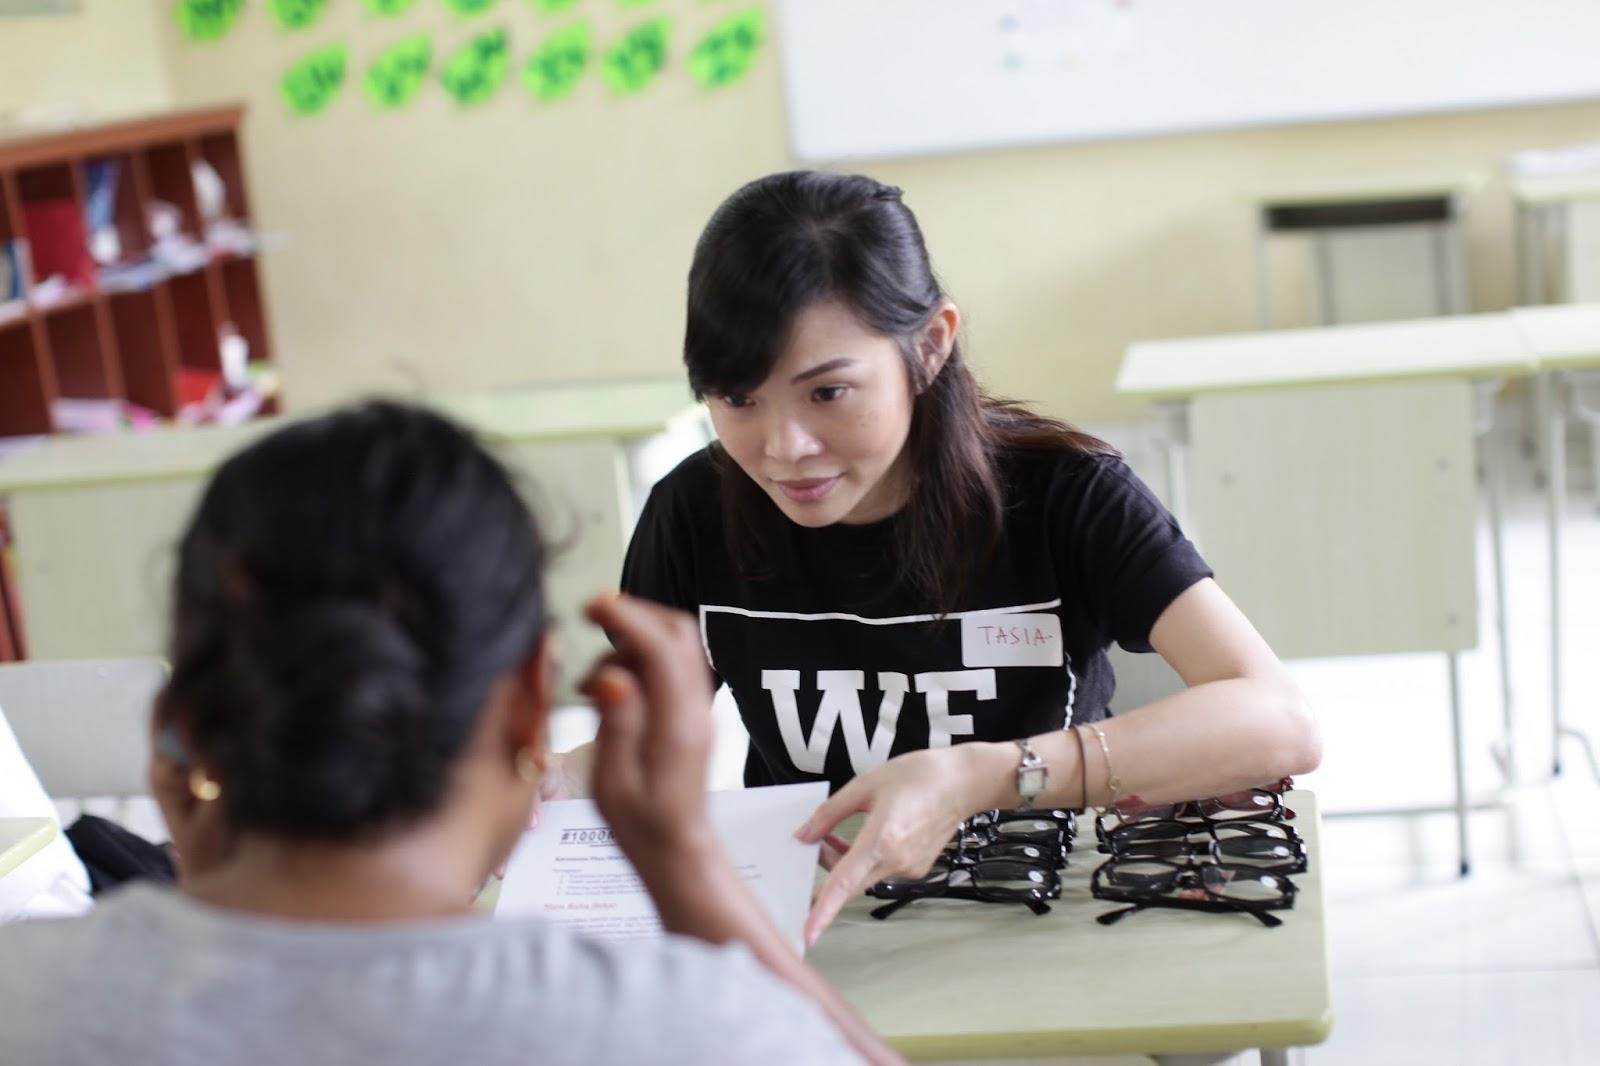 Bakti Sosial X - Sejuta Kacamata untuk Indonesia - Vihara Punna Karya image